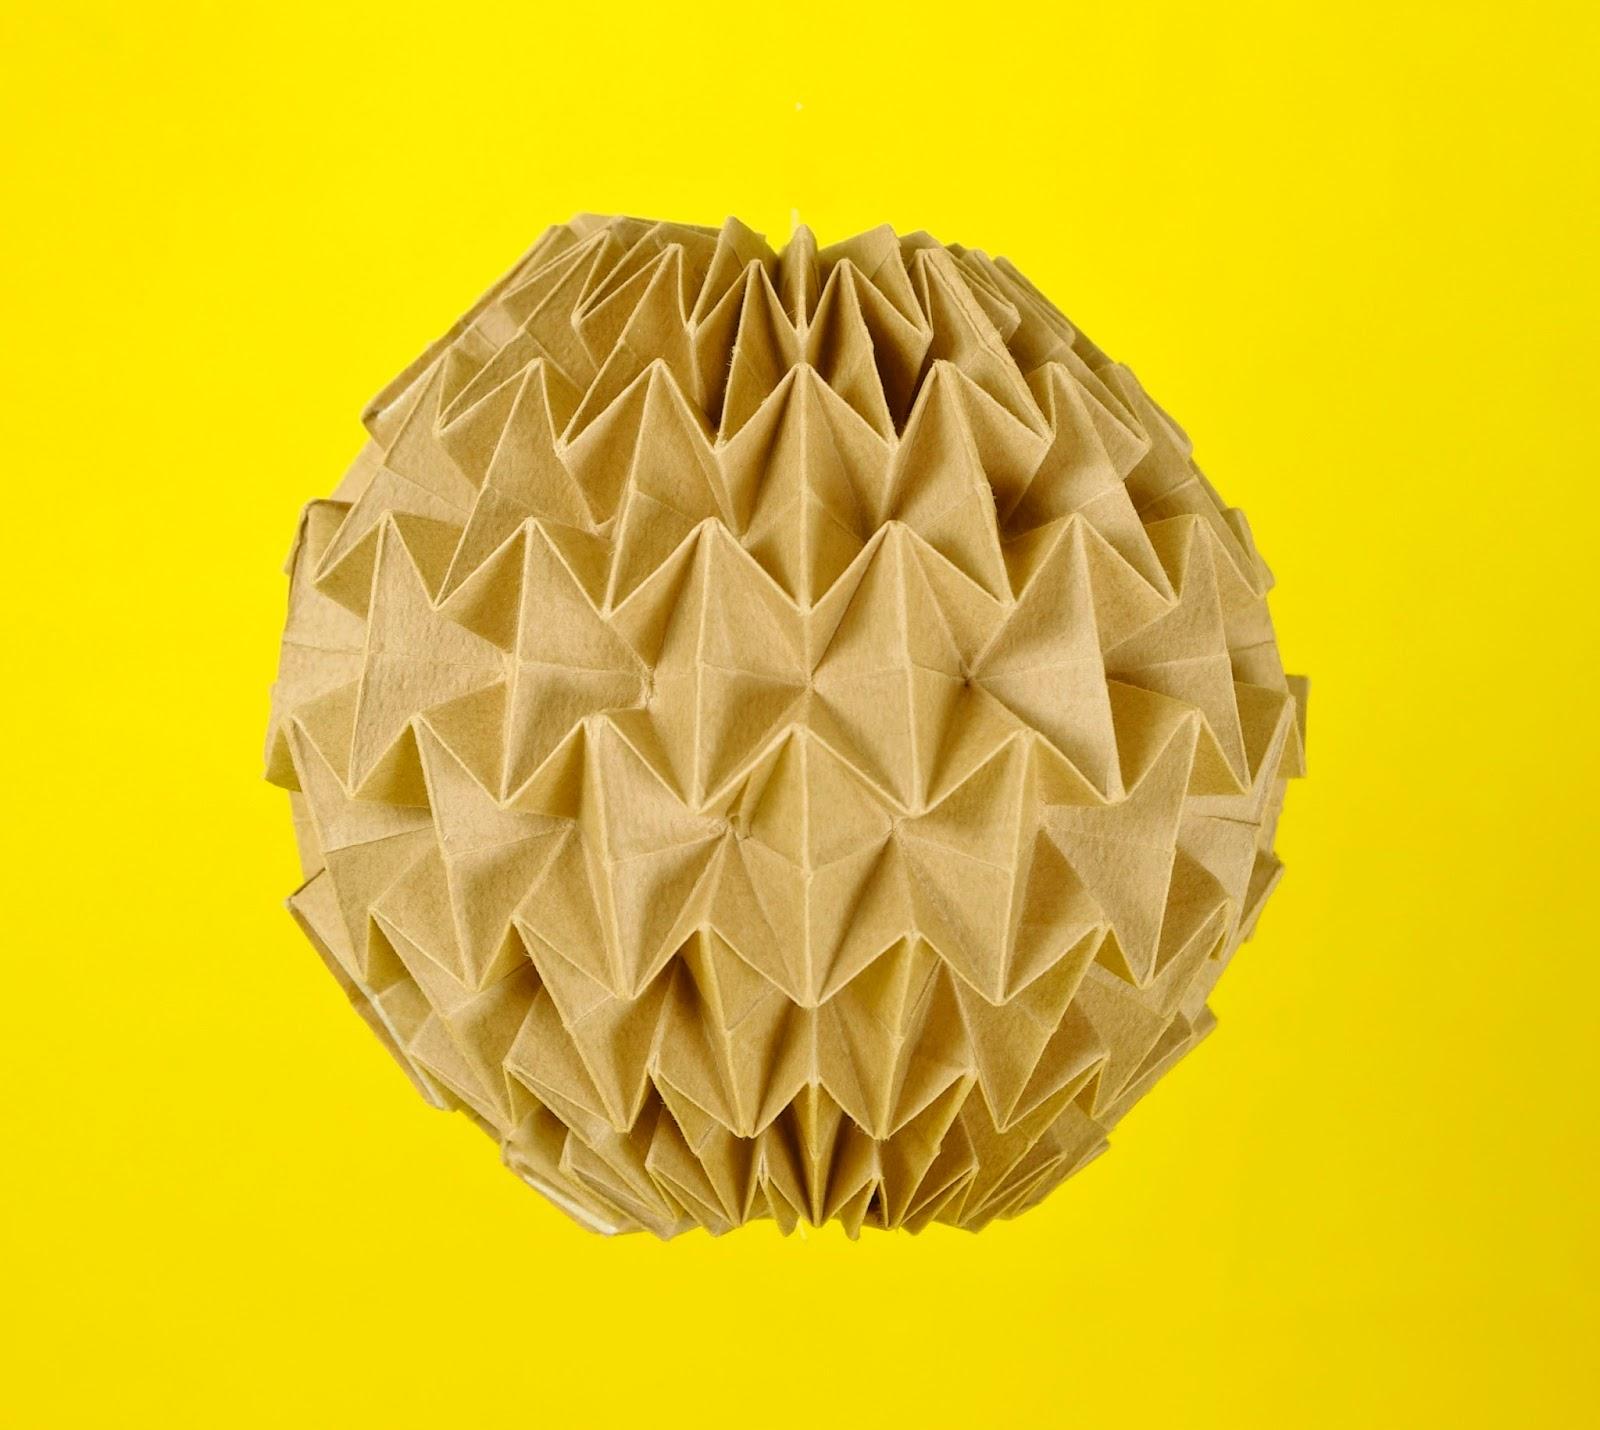 Magic Ball Aka Dragons Egg From Video Tutorial By Jo Nakashima